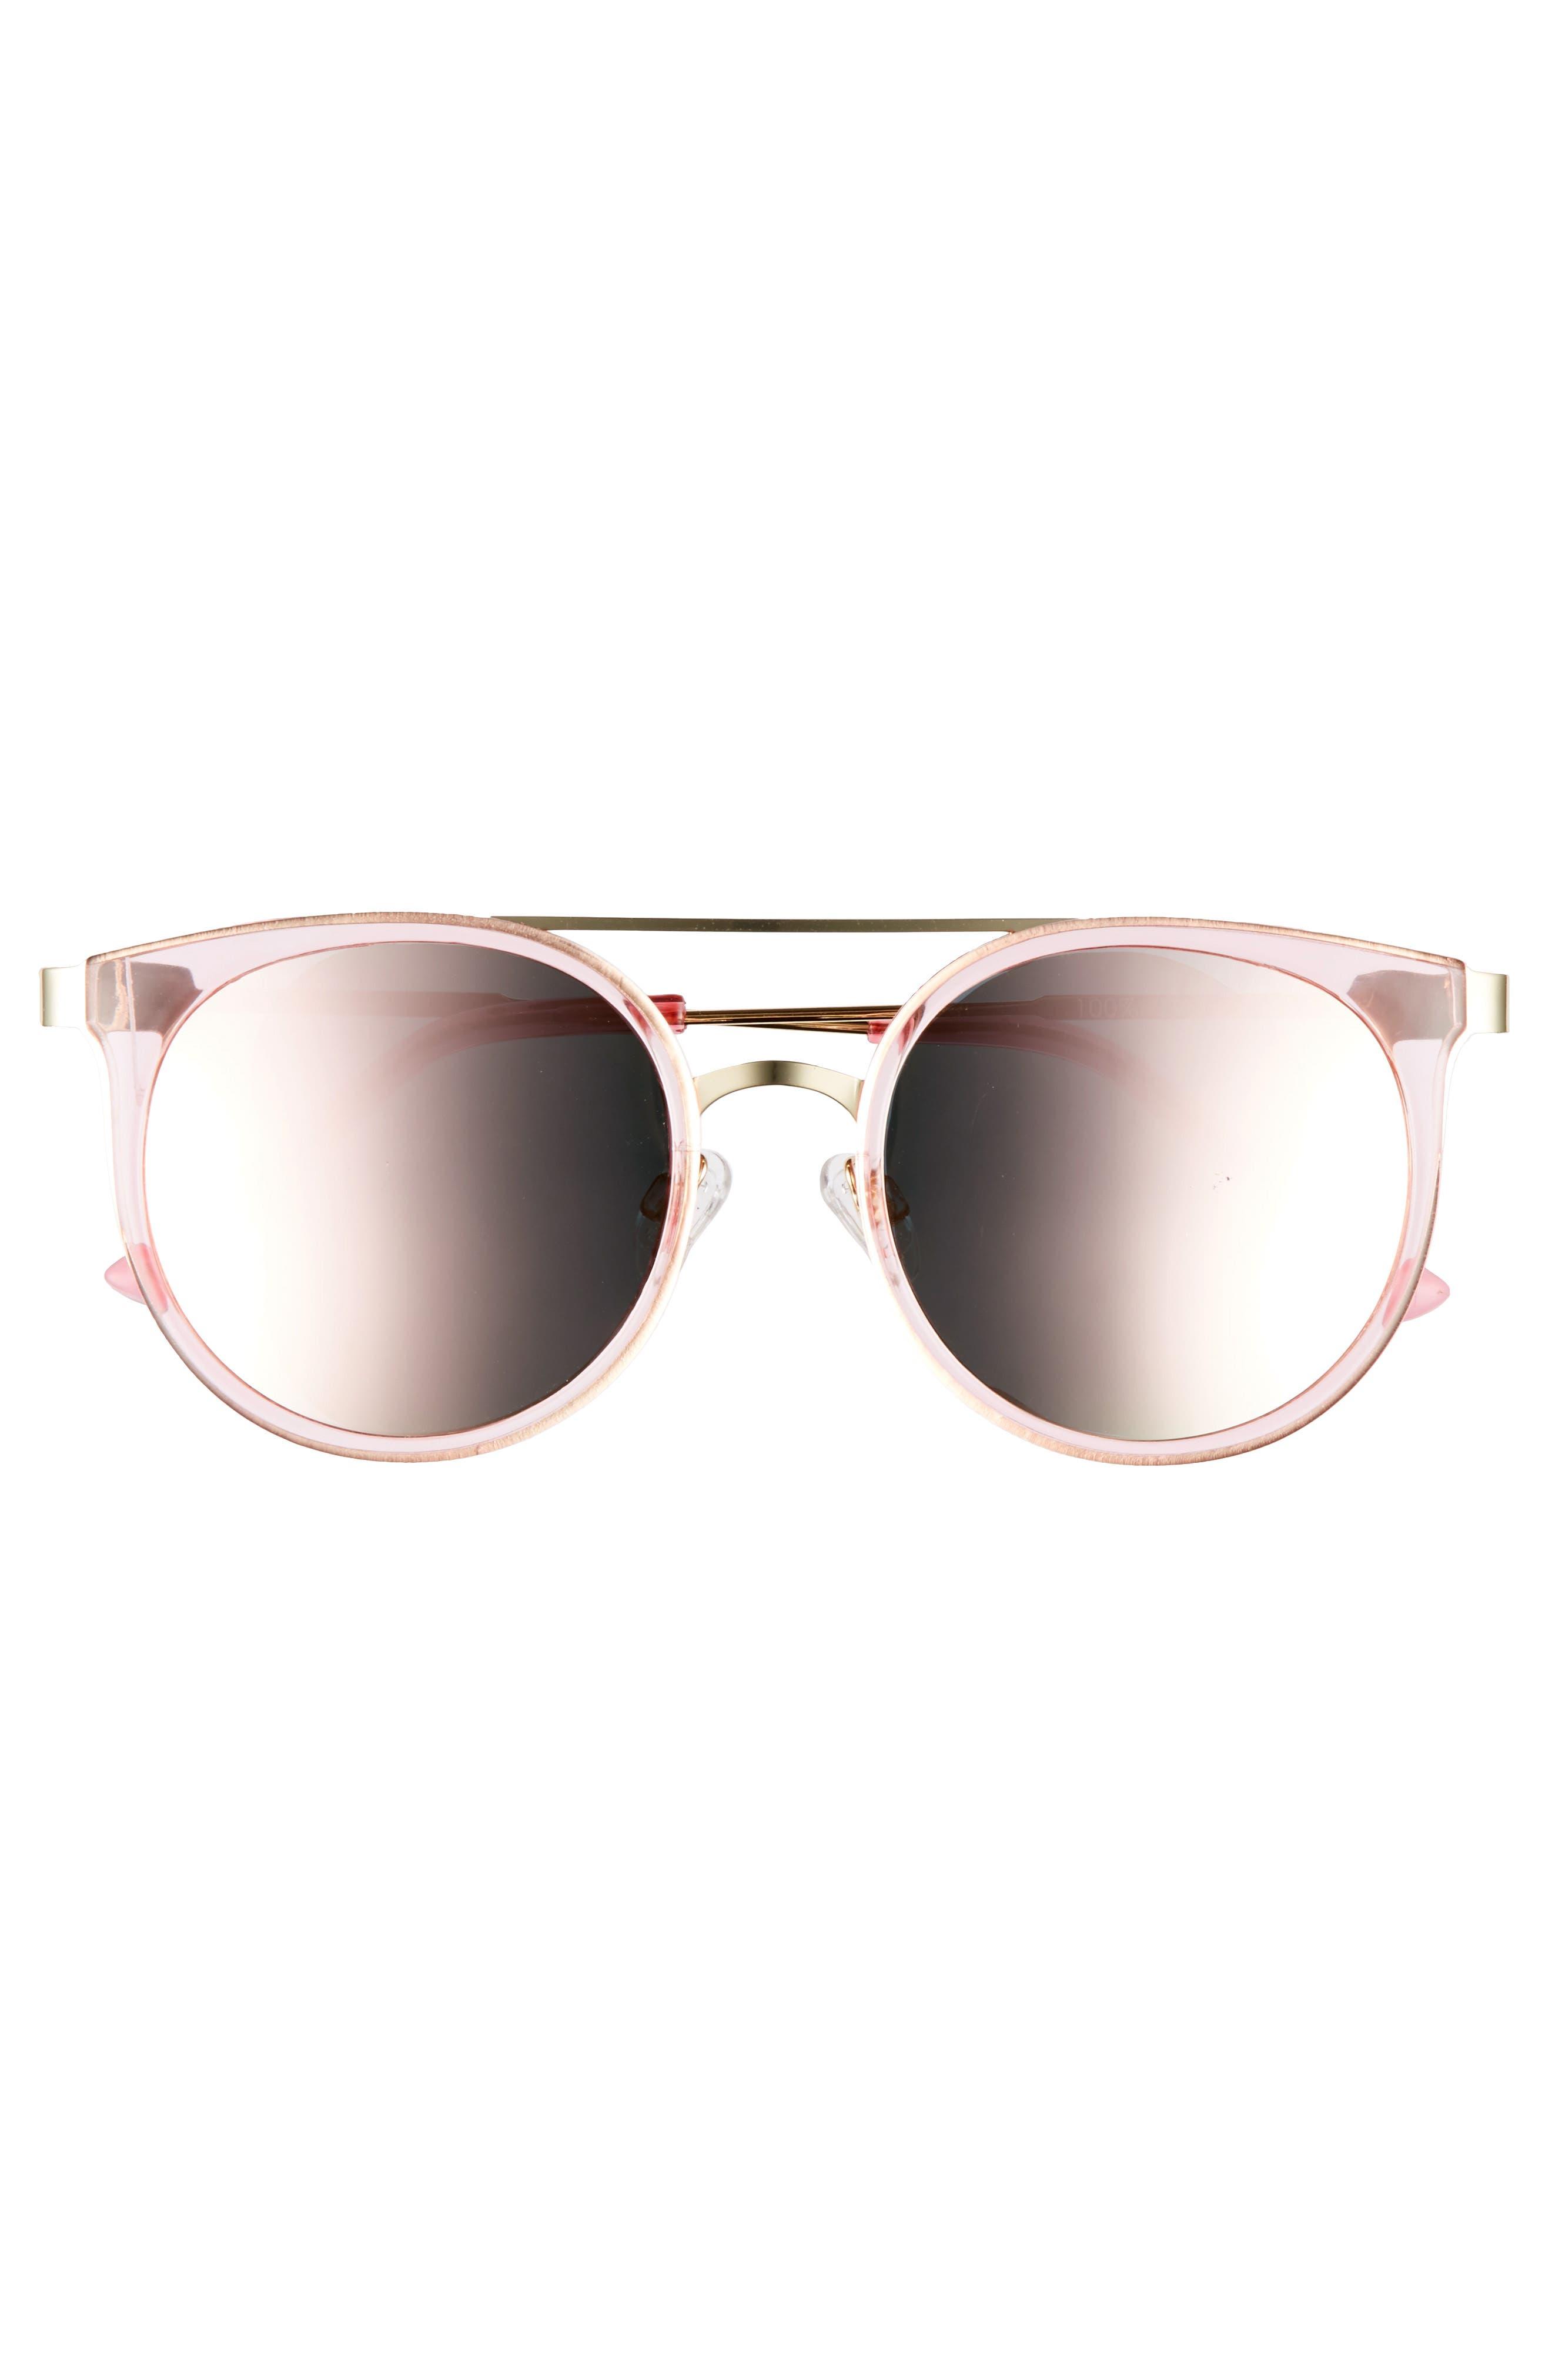 52mm Mirror Lens Round Sunglasses,                             Alternate thumbnail 3, color,                             710